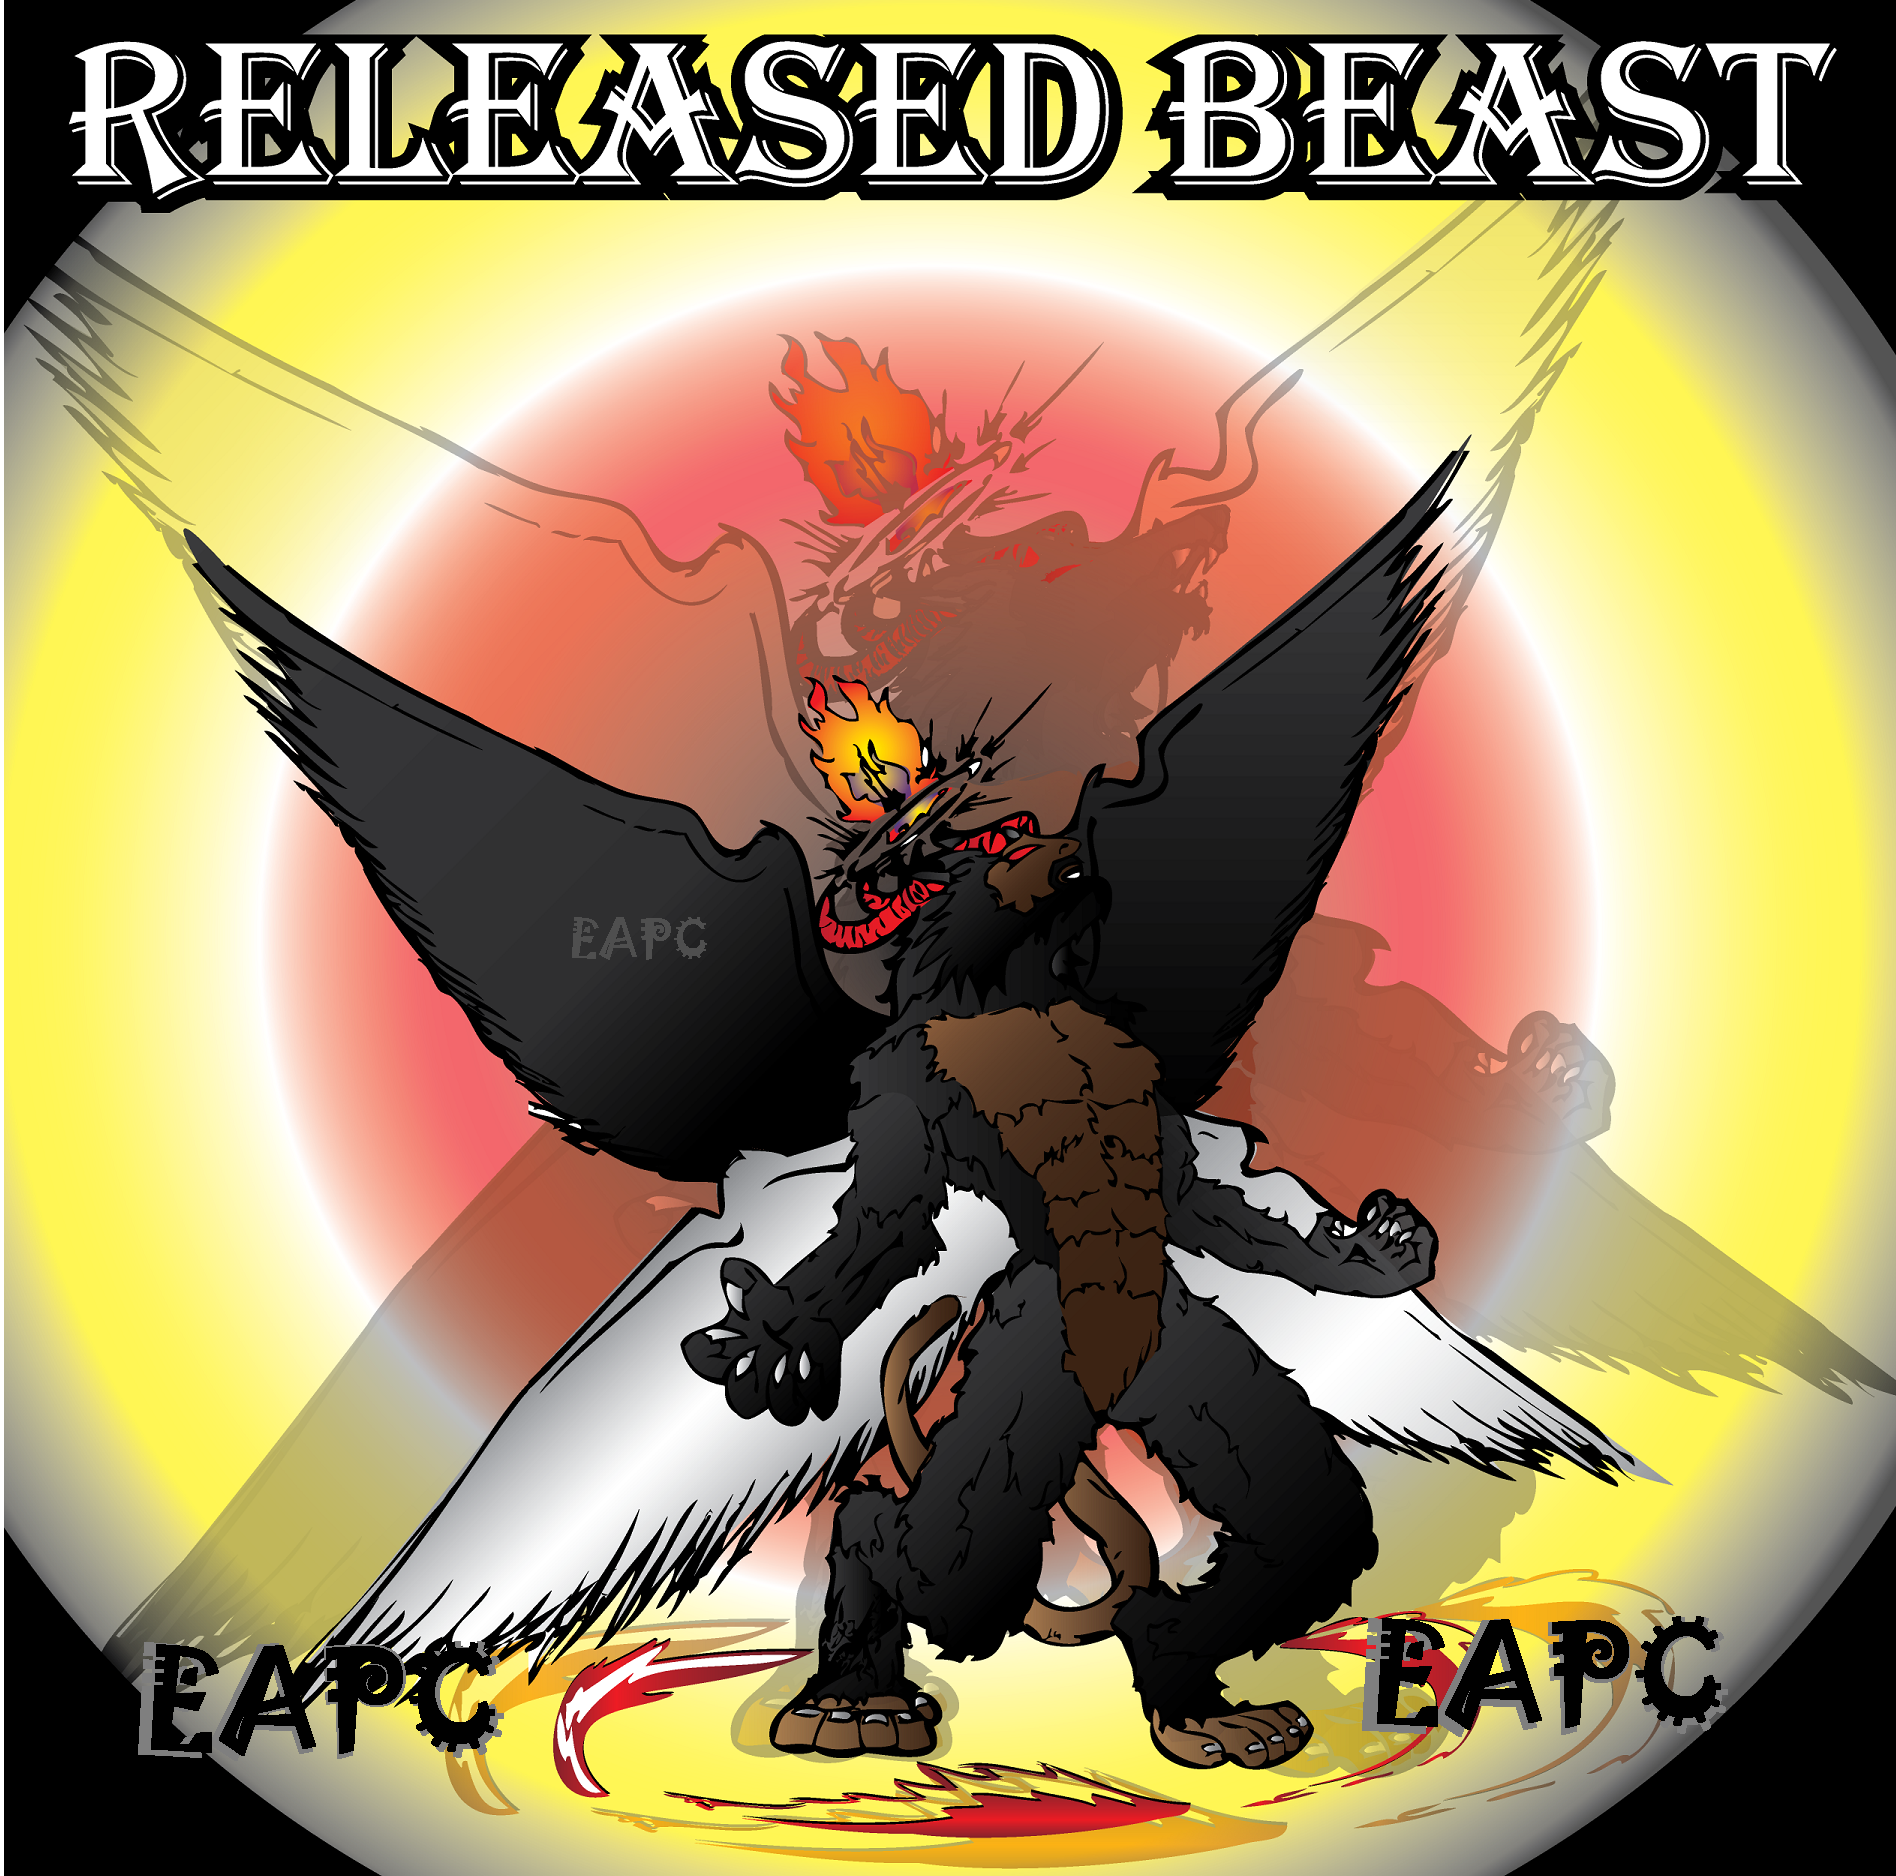 Released Beast